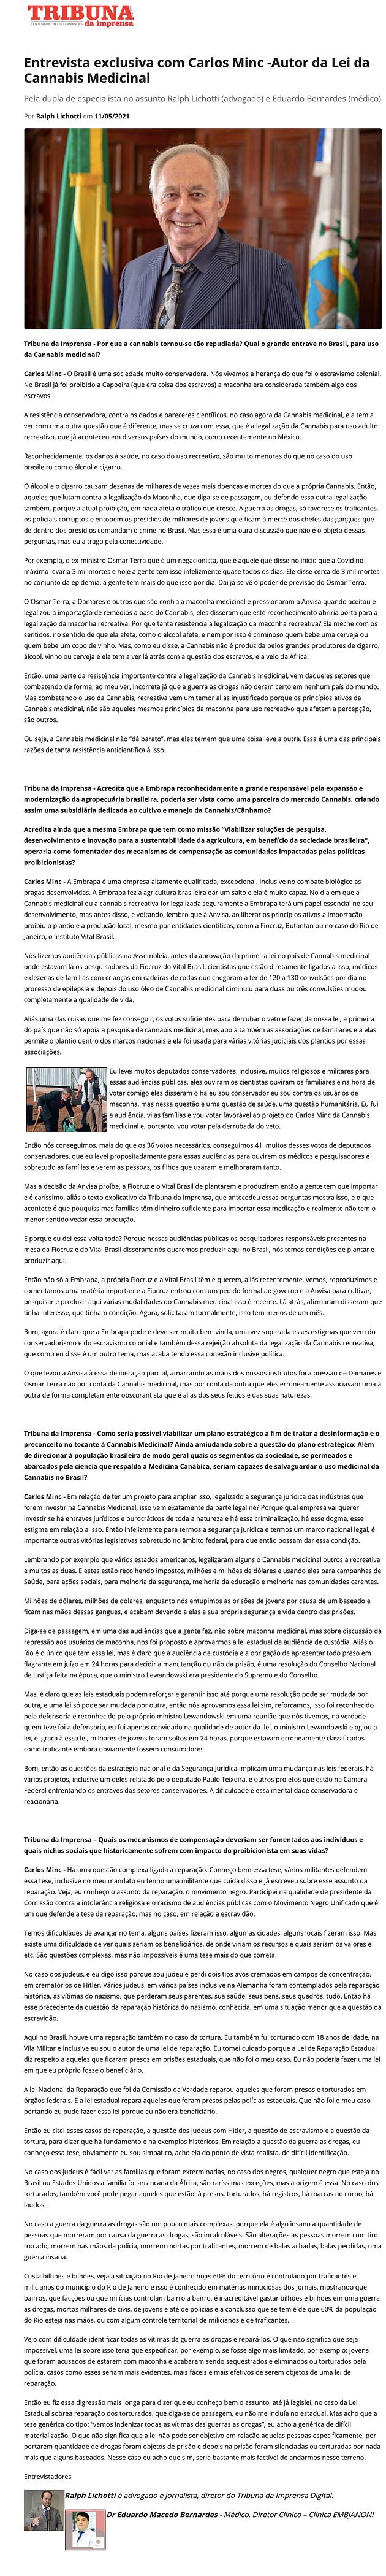 screenshot-www.tribunadaimprensadigital.